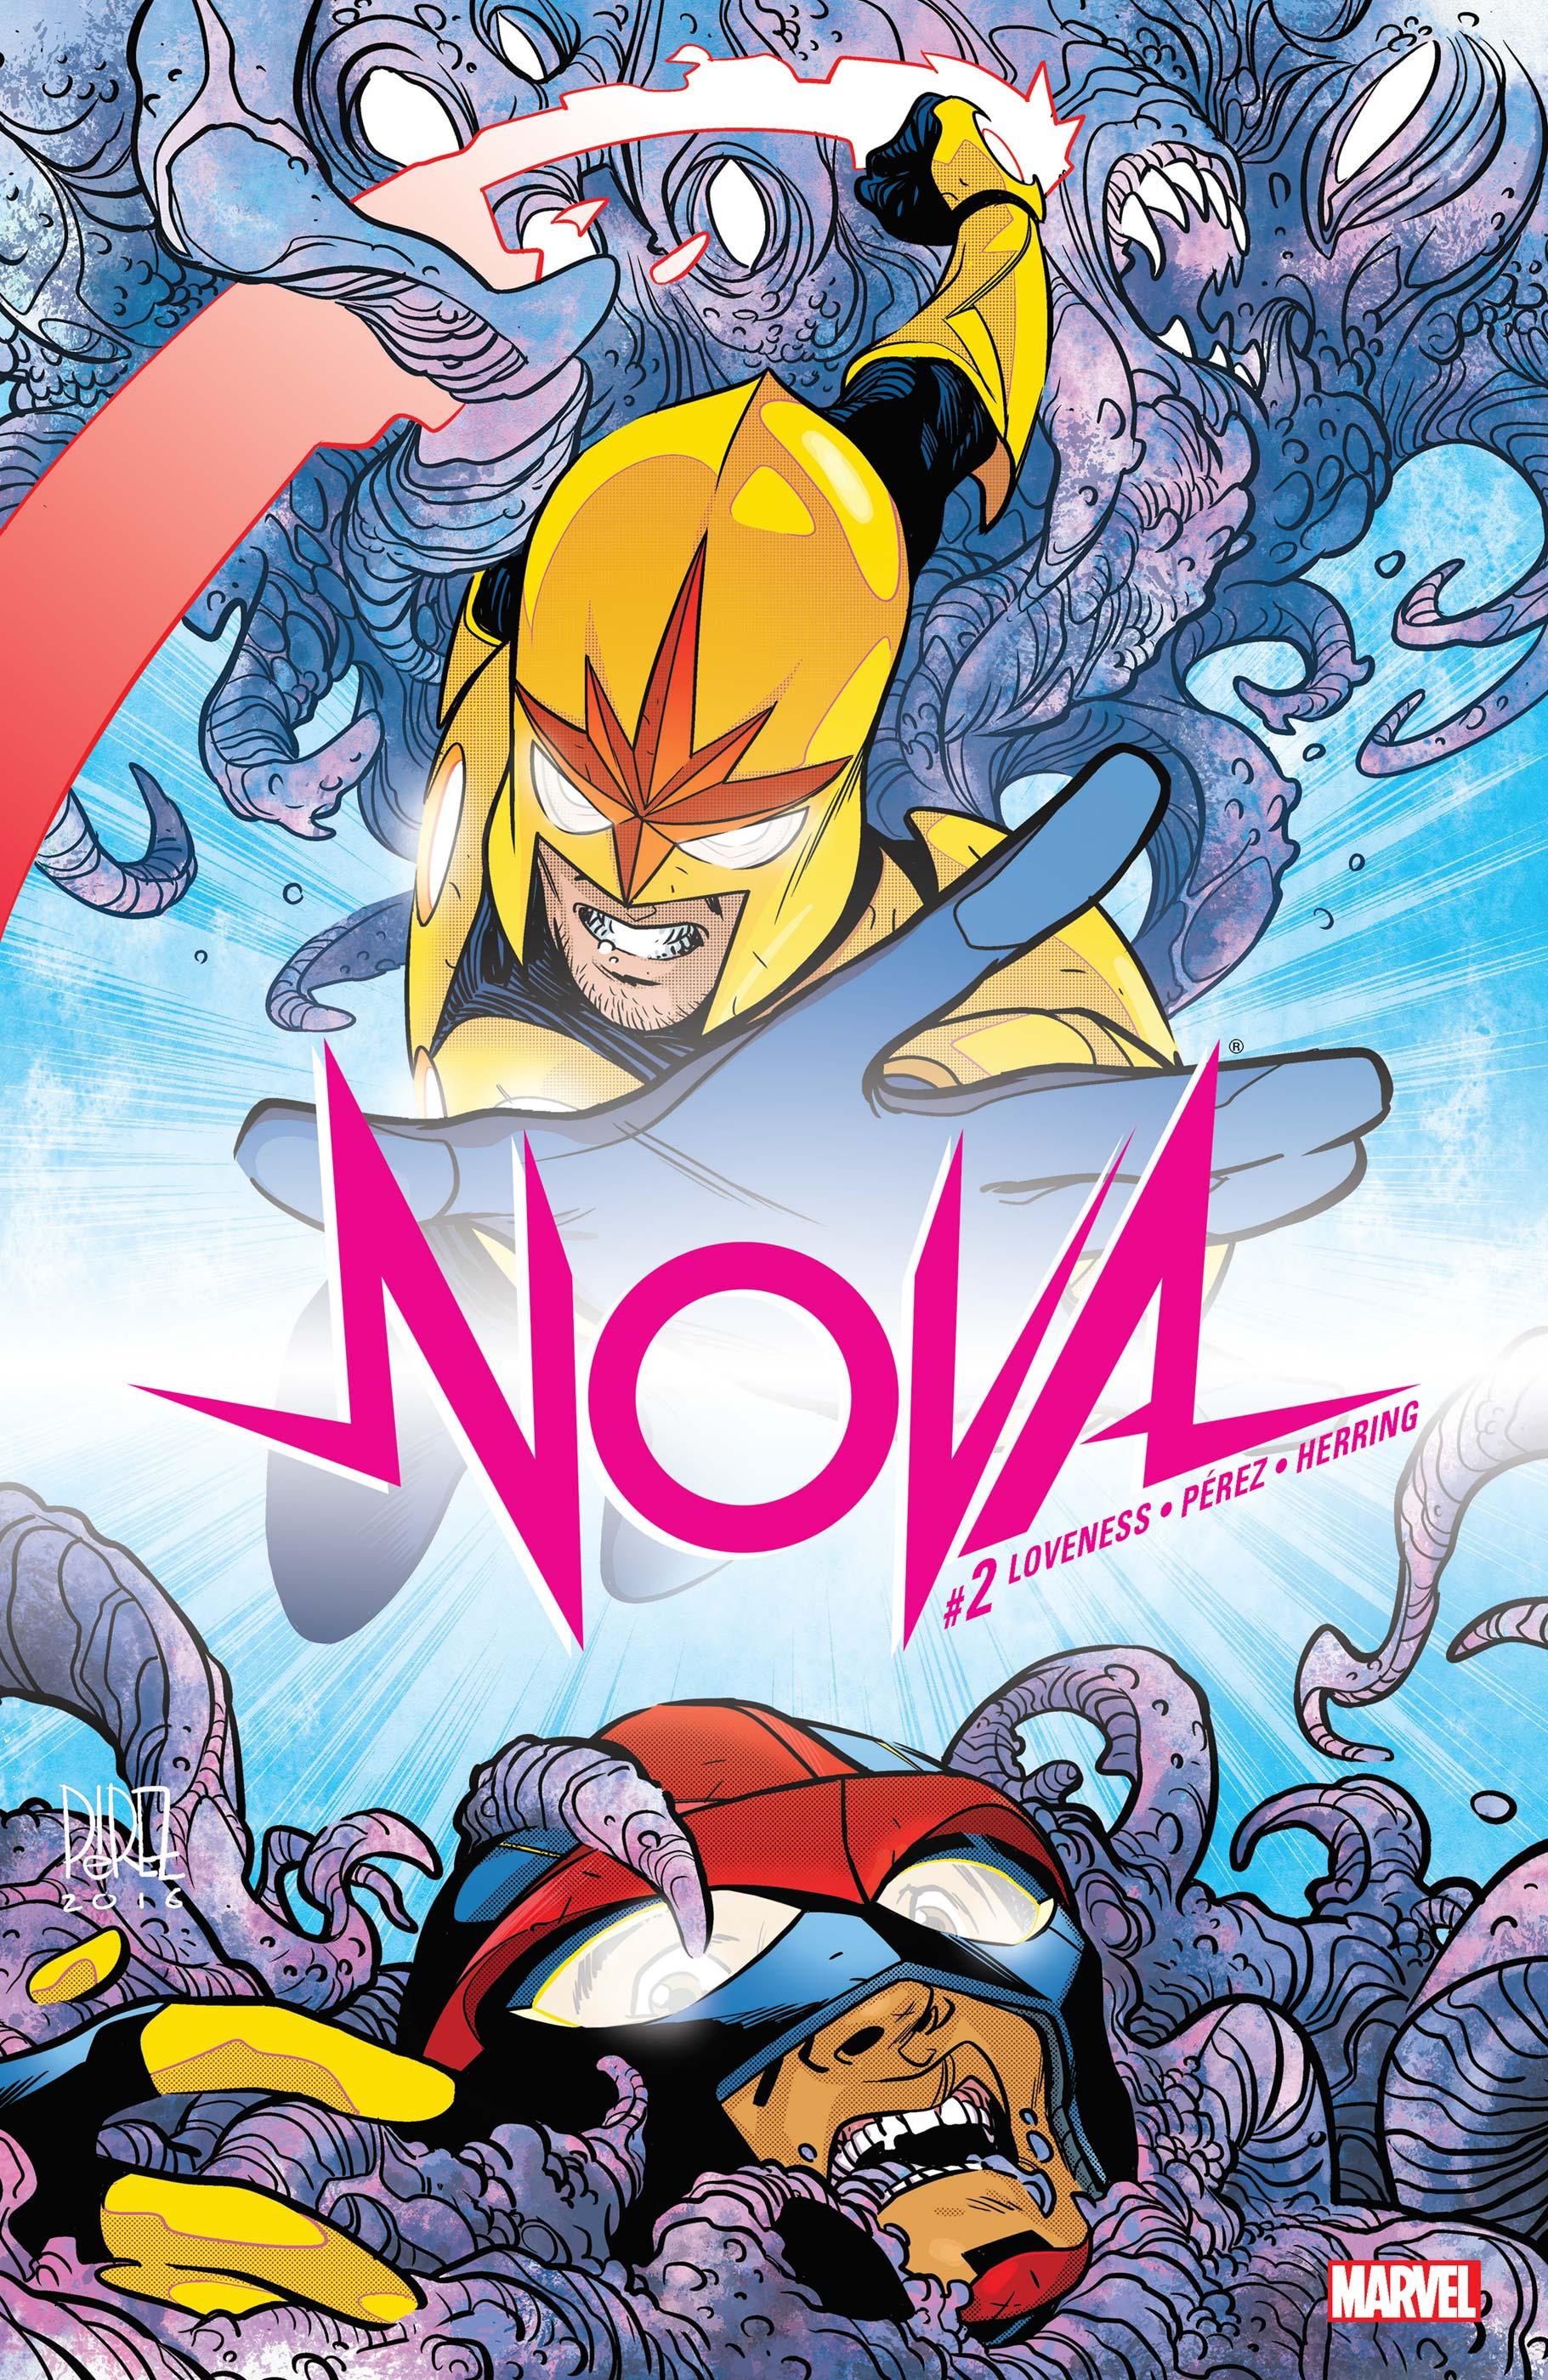 Nova (2016) #2